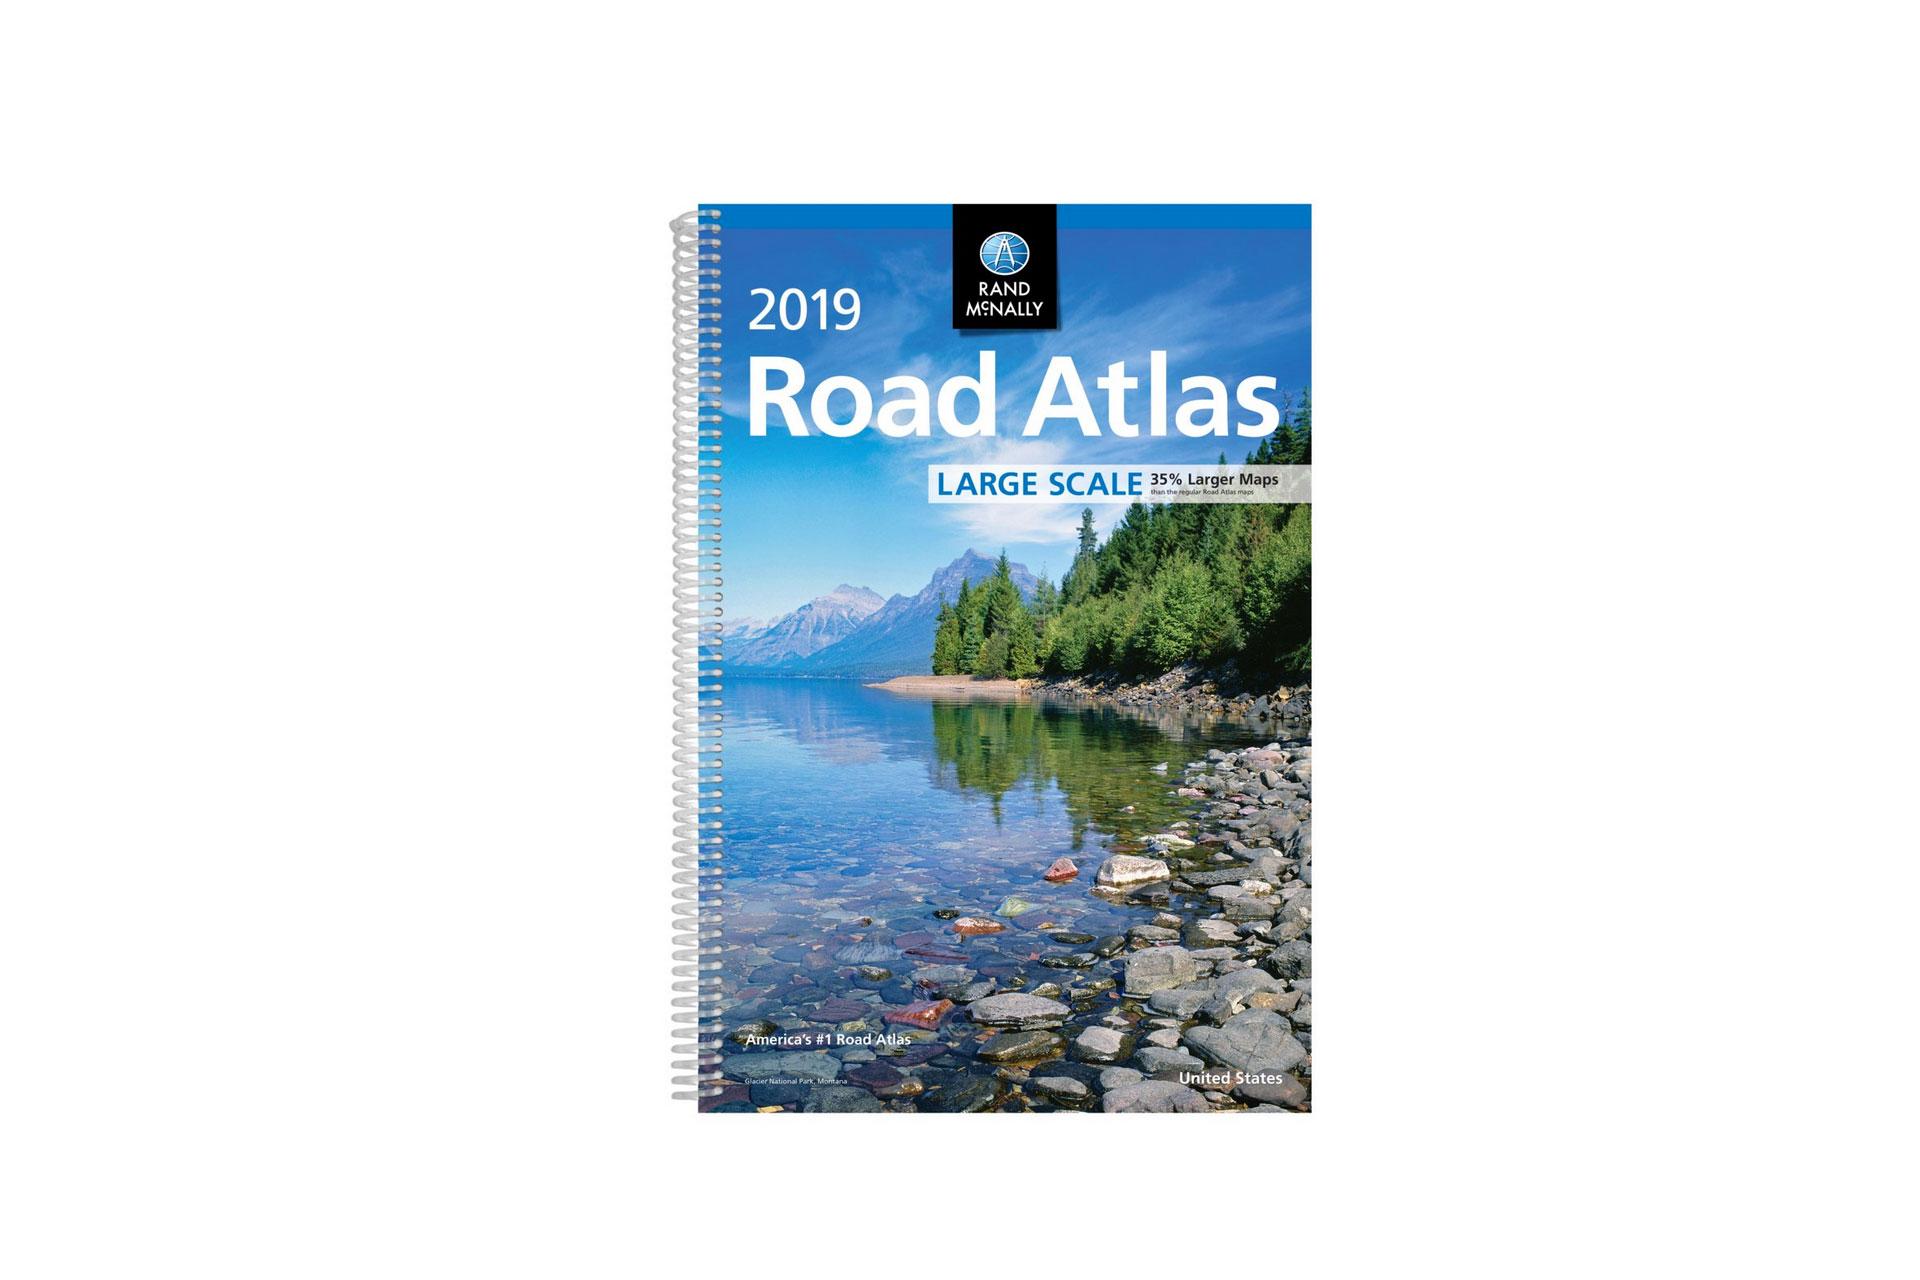 2019 Road Atlas; Courtesy of Amazon